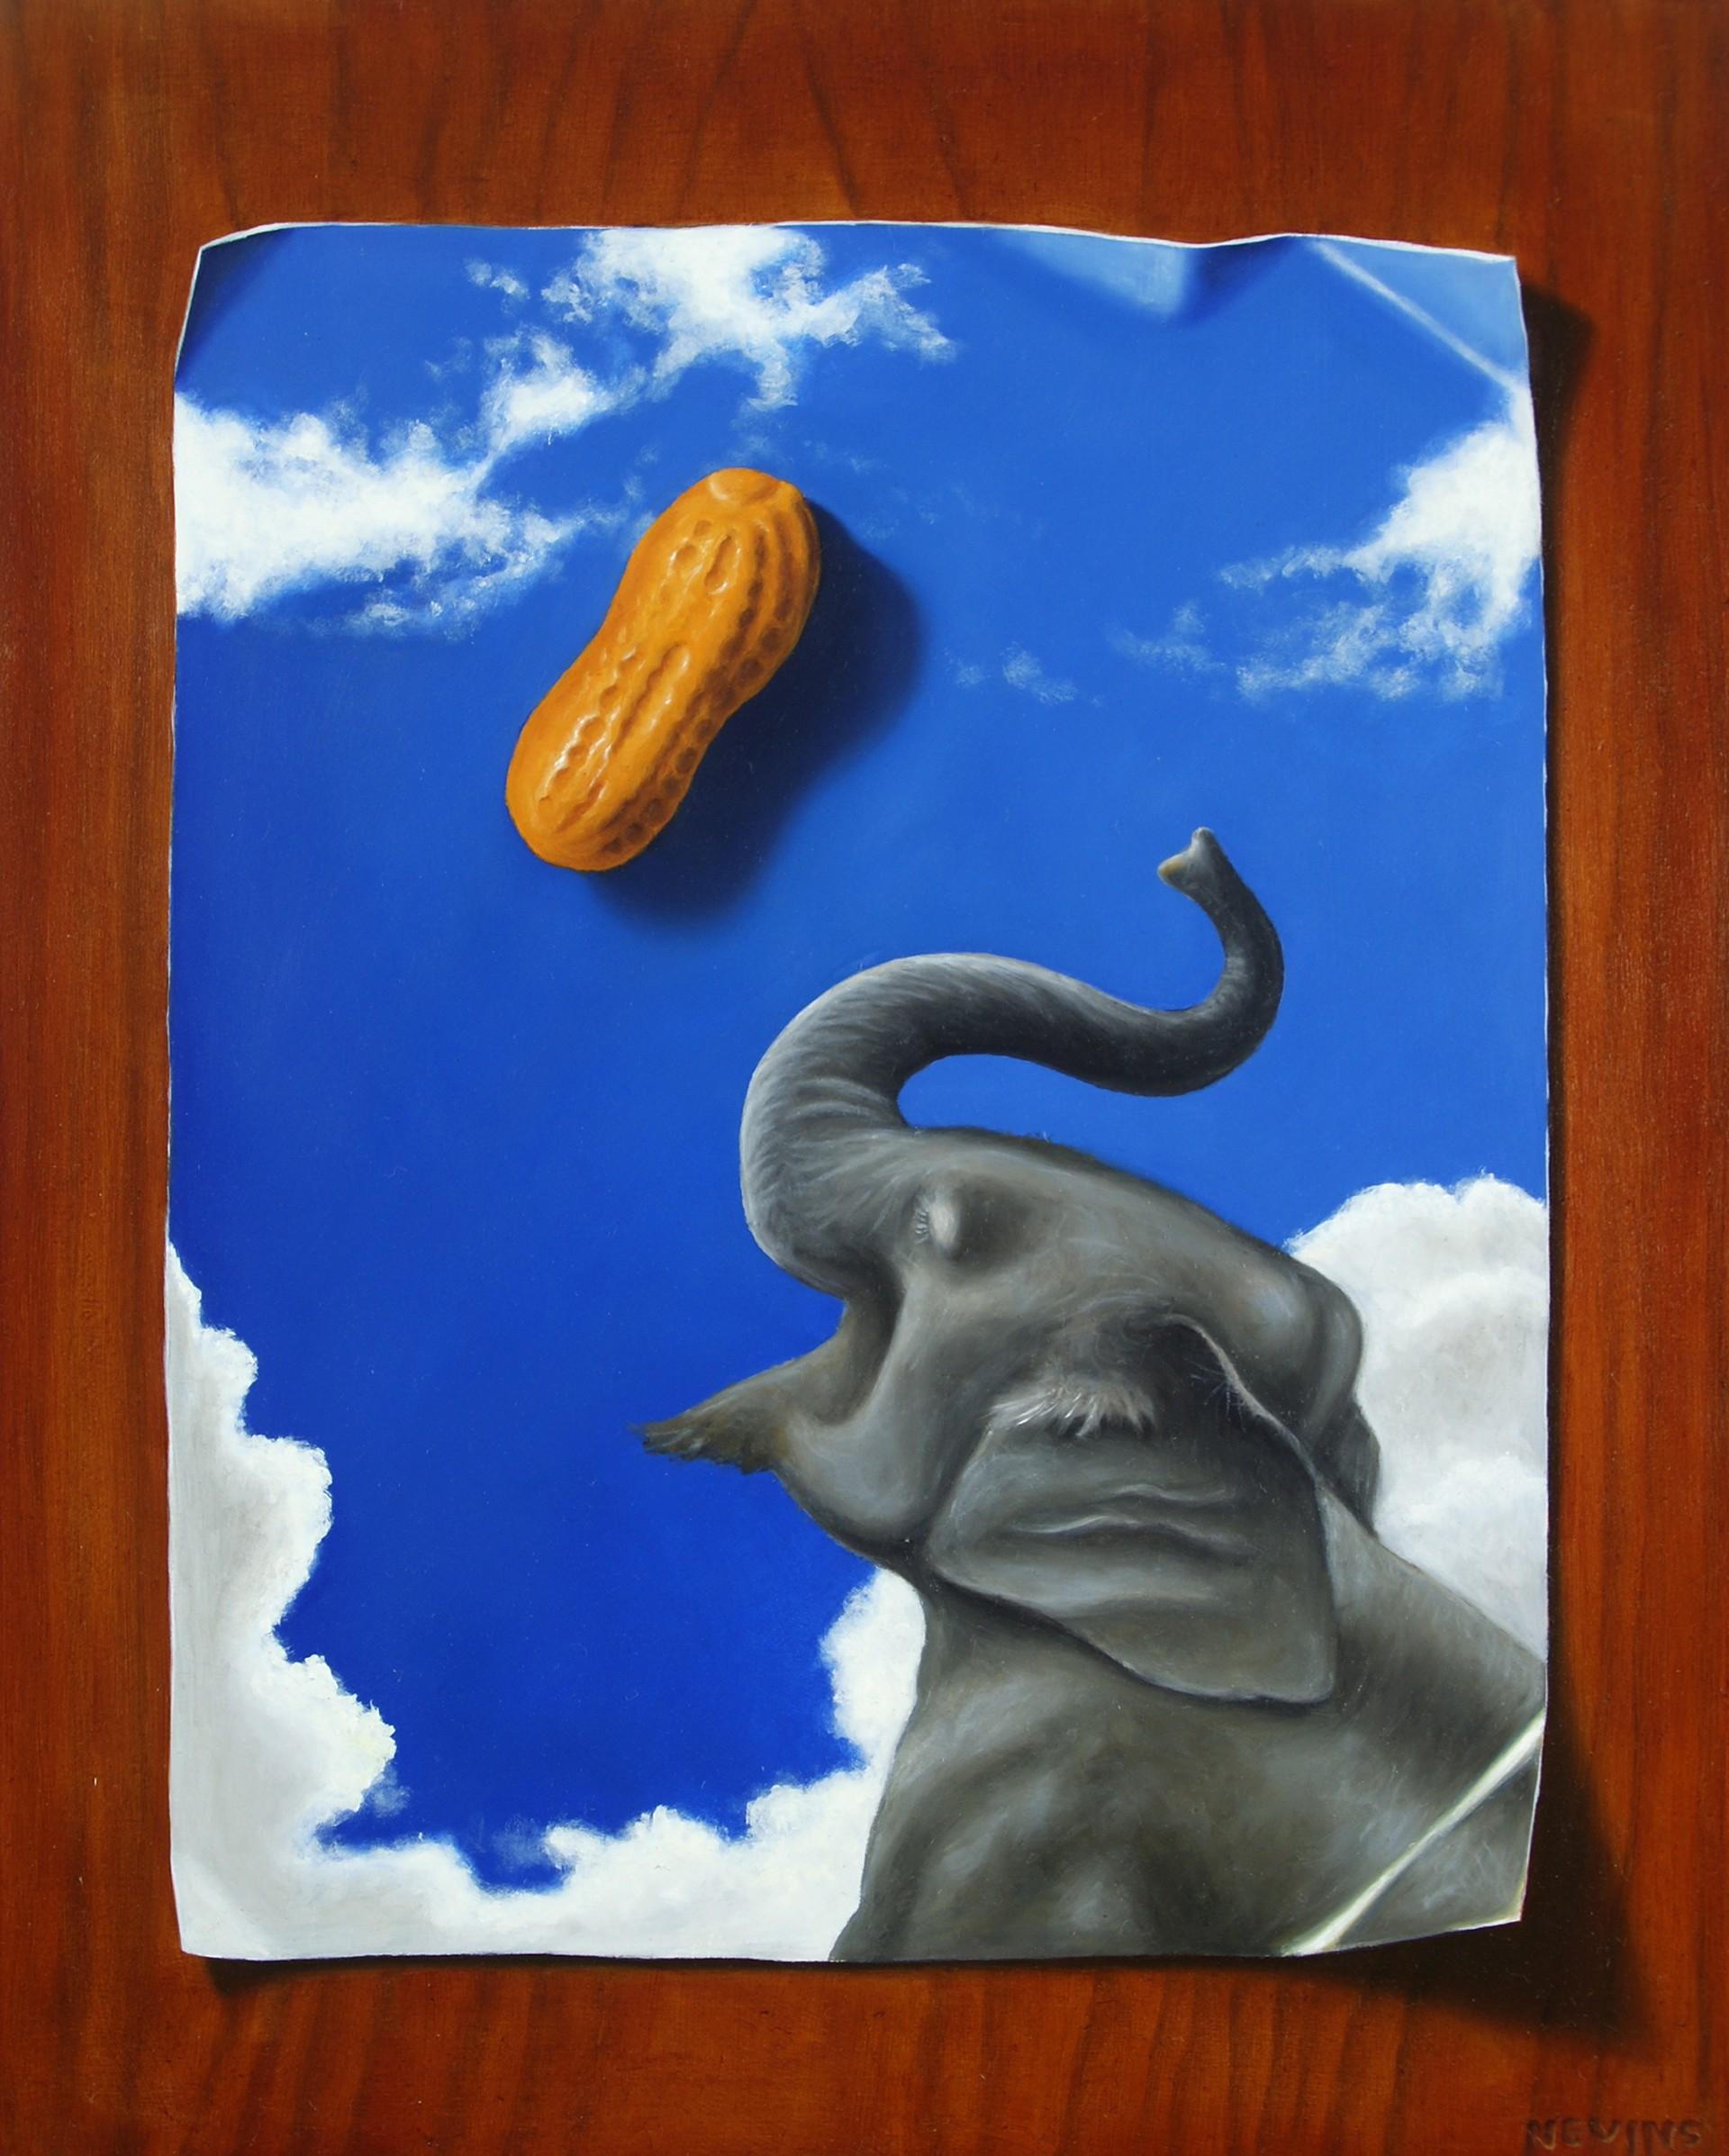 Circus Peanut by Patrick Nevins